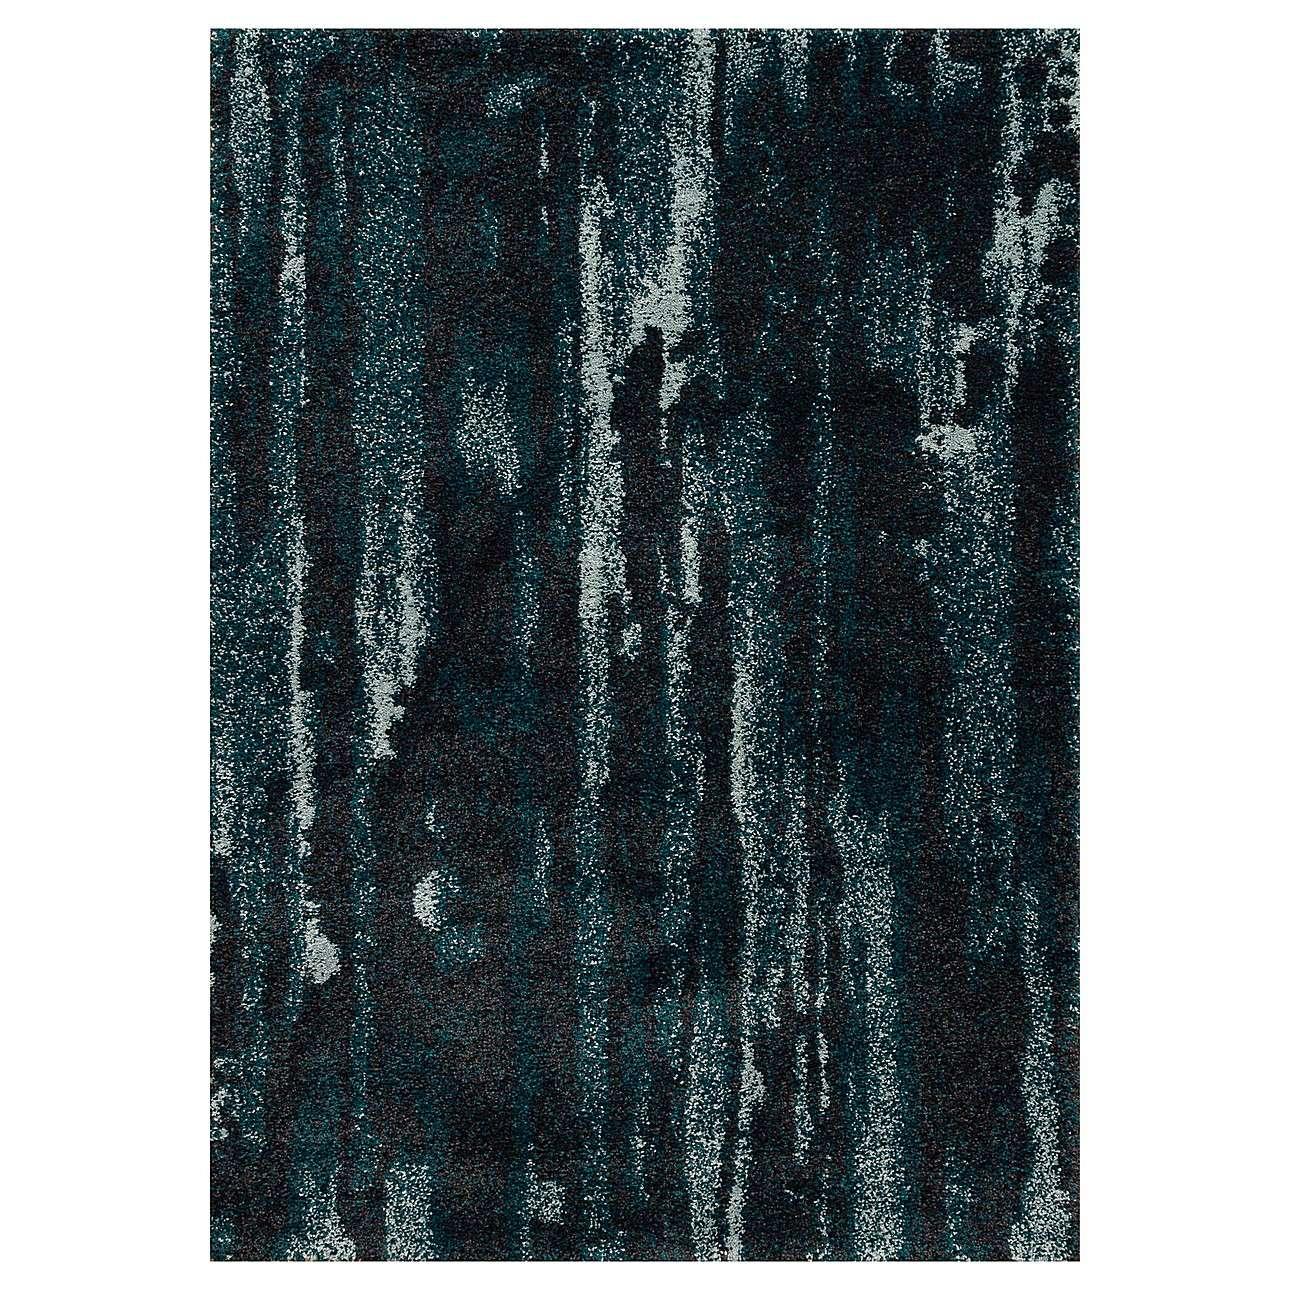 Dywan Softness near black/peacock blue 120x170cm